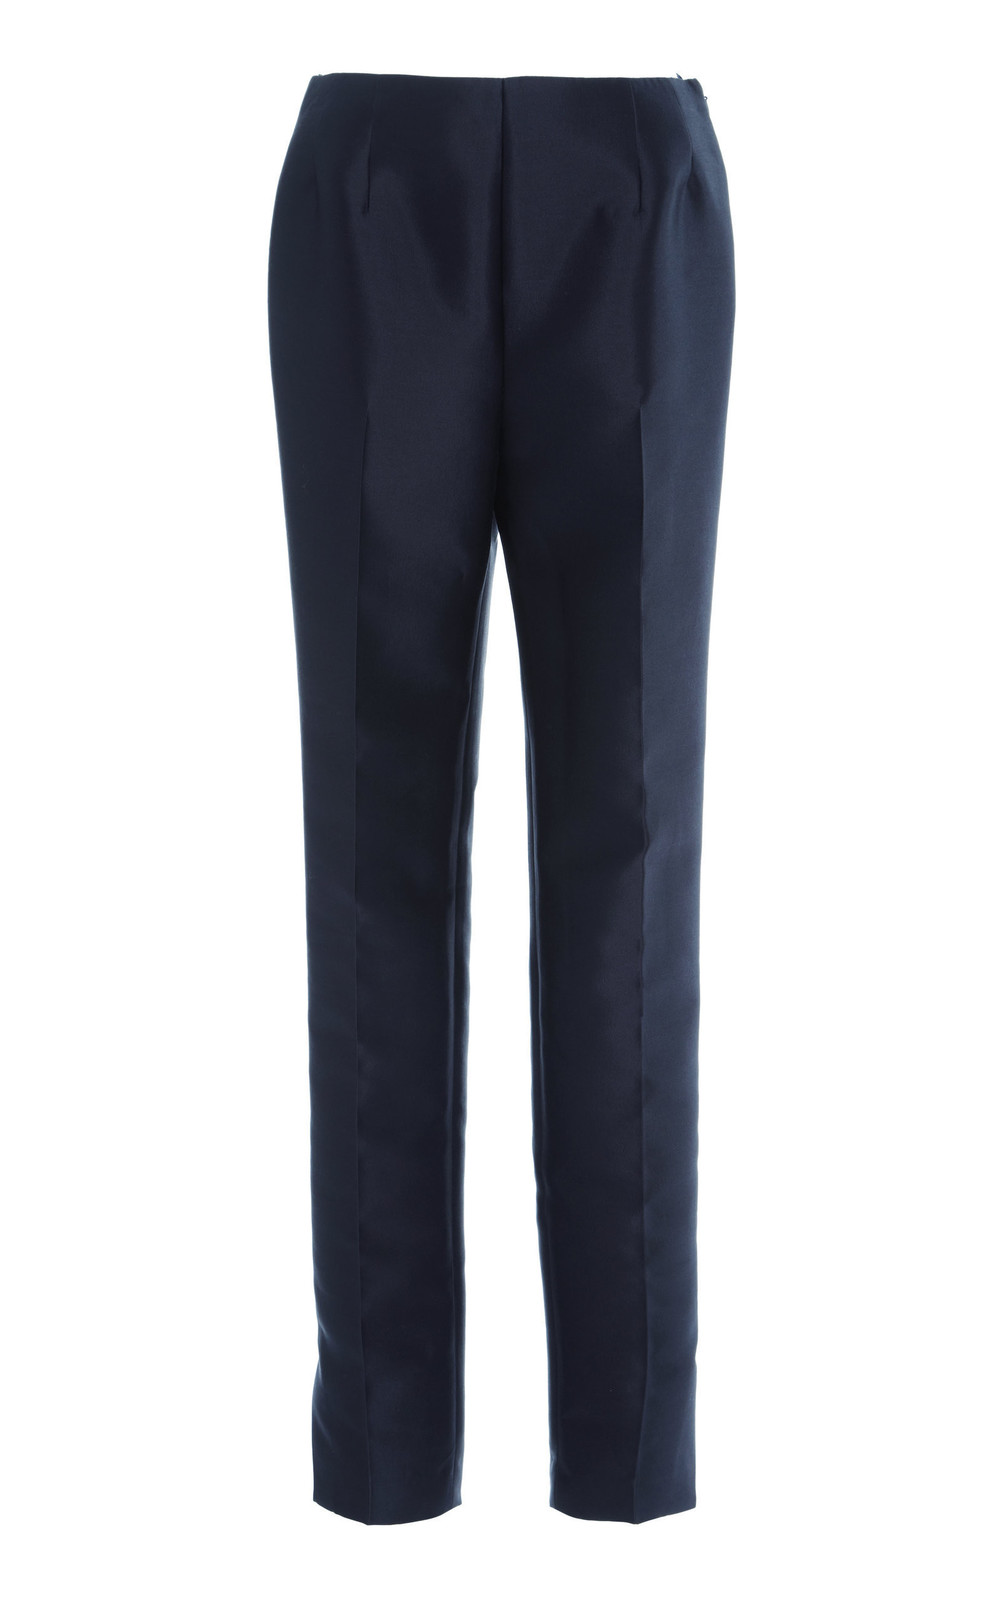 Gabriela Hearst Masto Silk-Blend Tailored Pants in navy